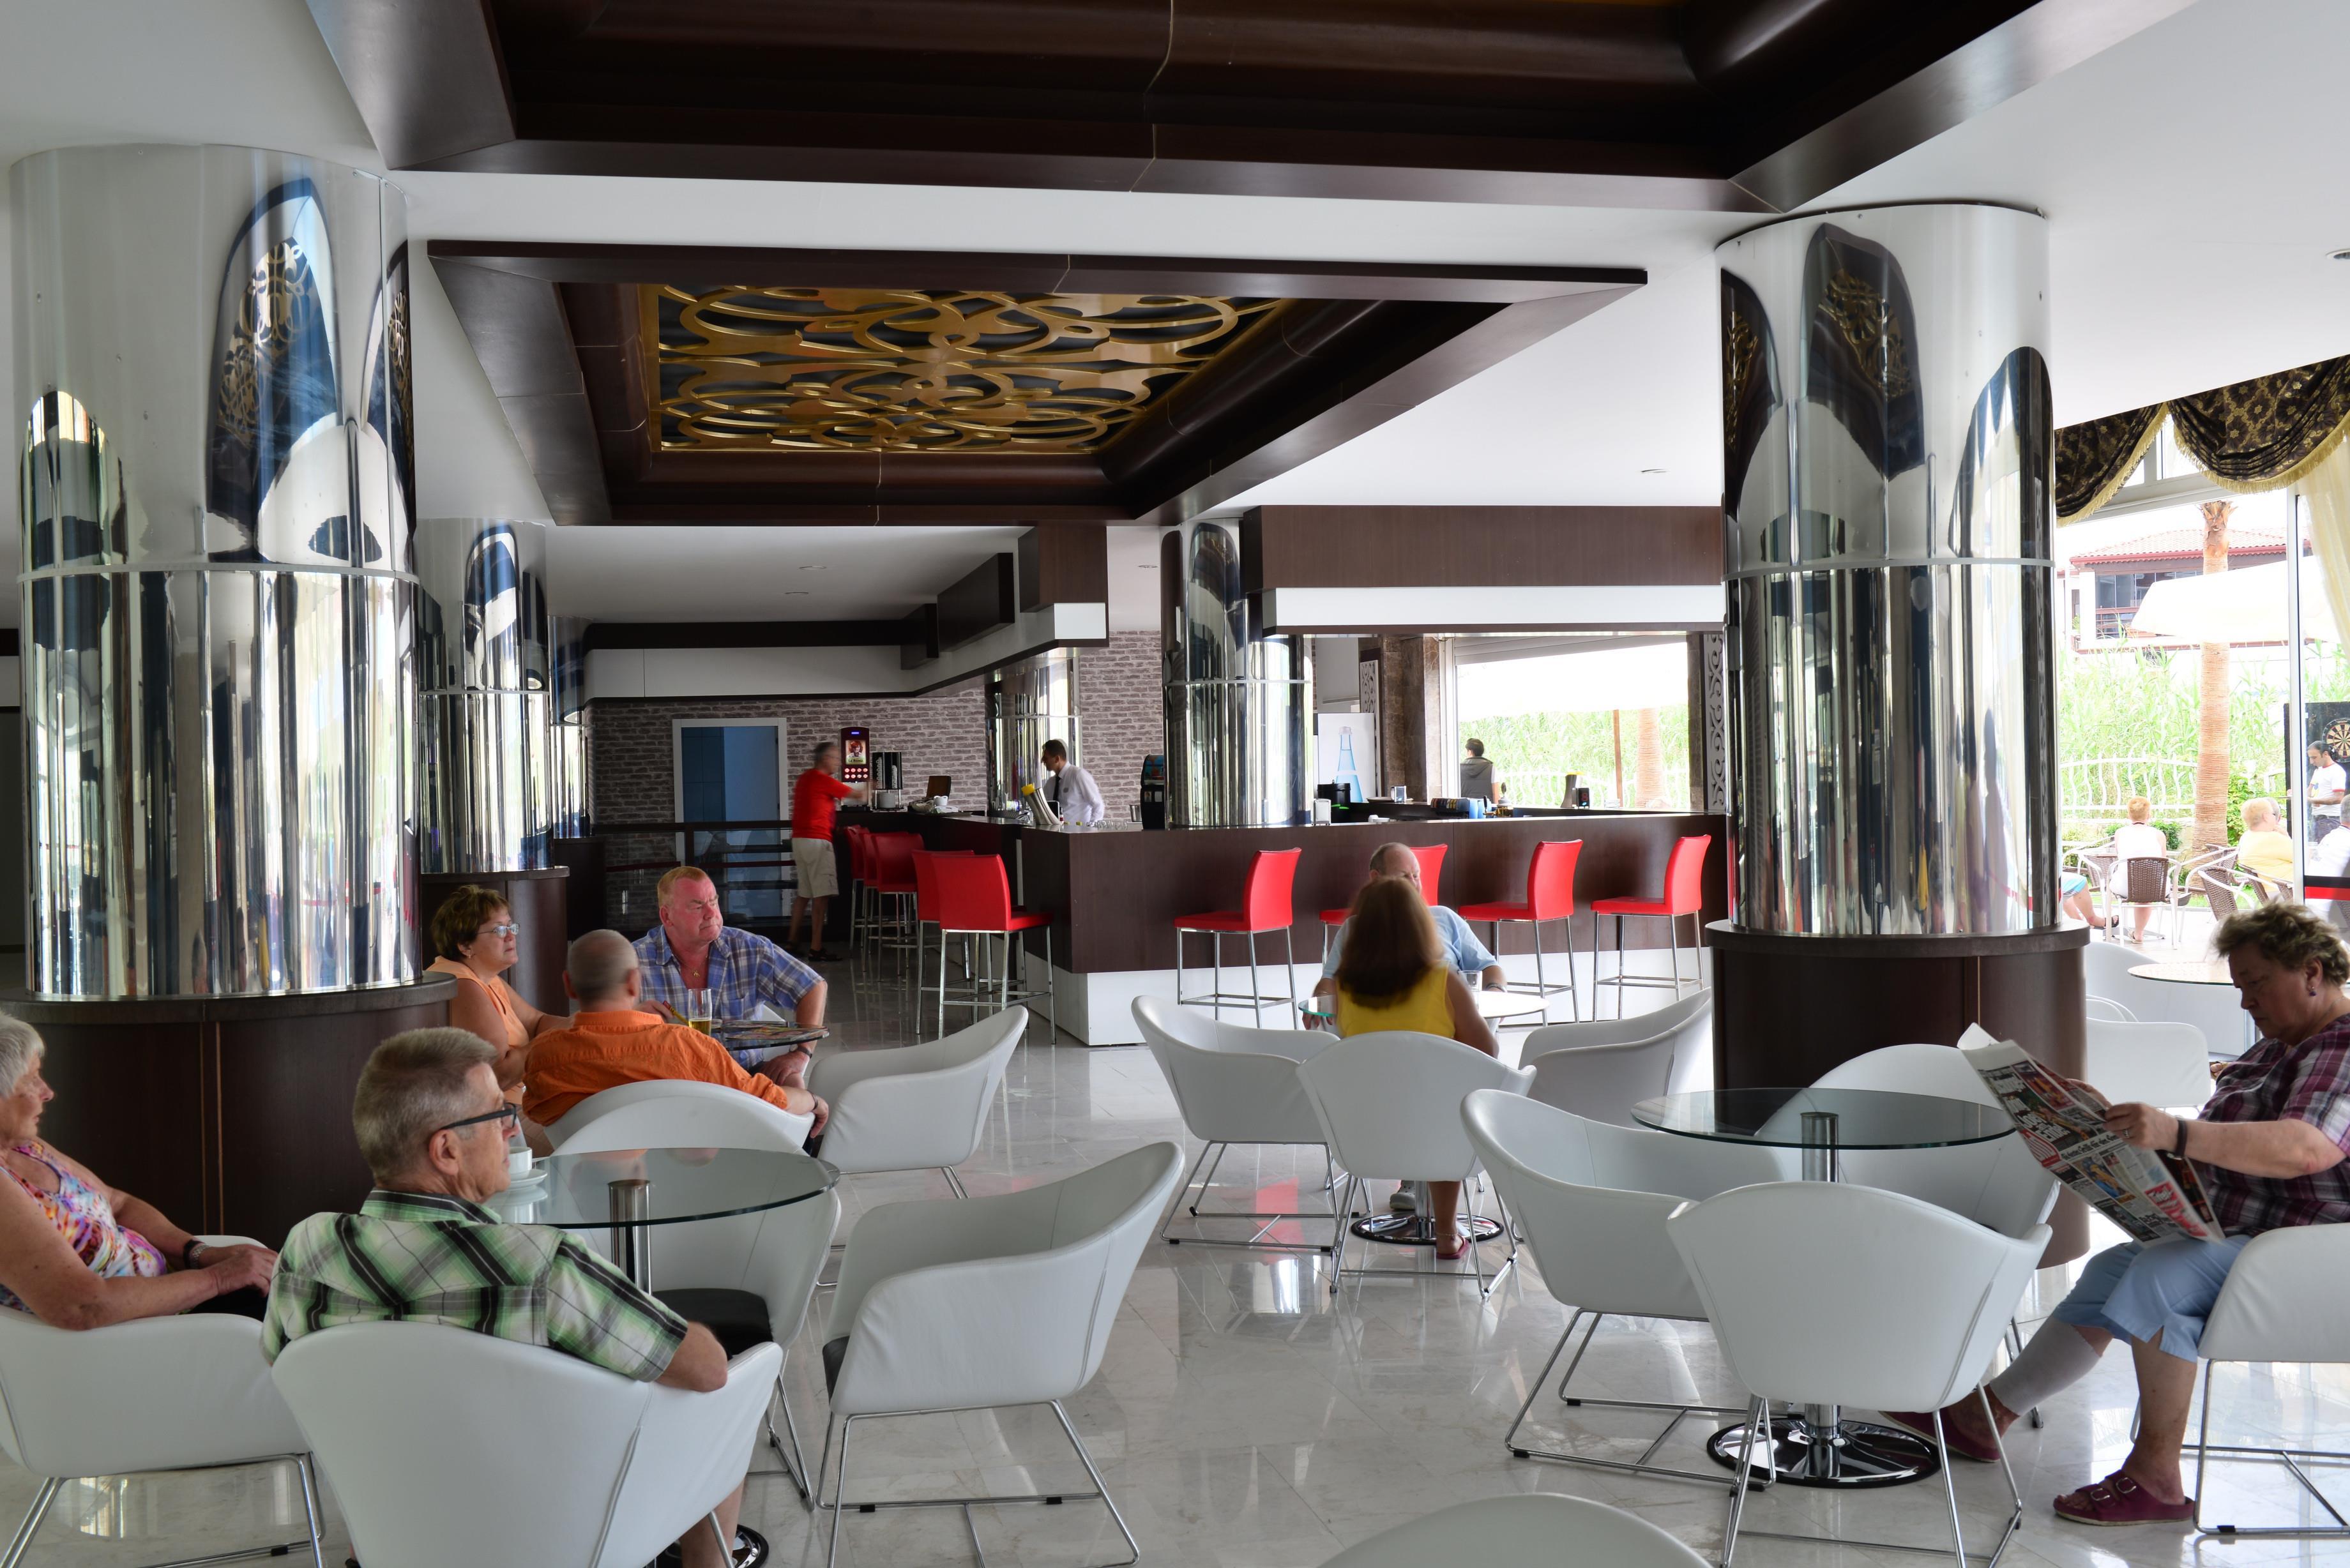 http://www.orextravel.sk/OREX/hotelphotos/side-royal-paradise-general-0030.jpg